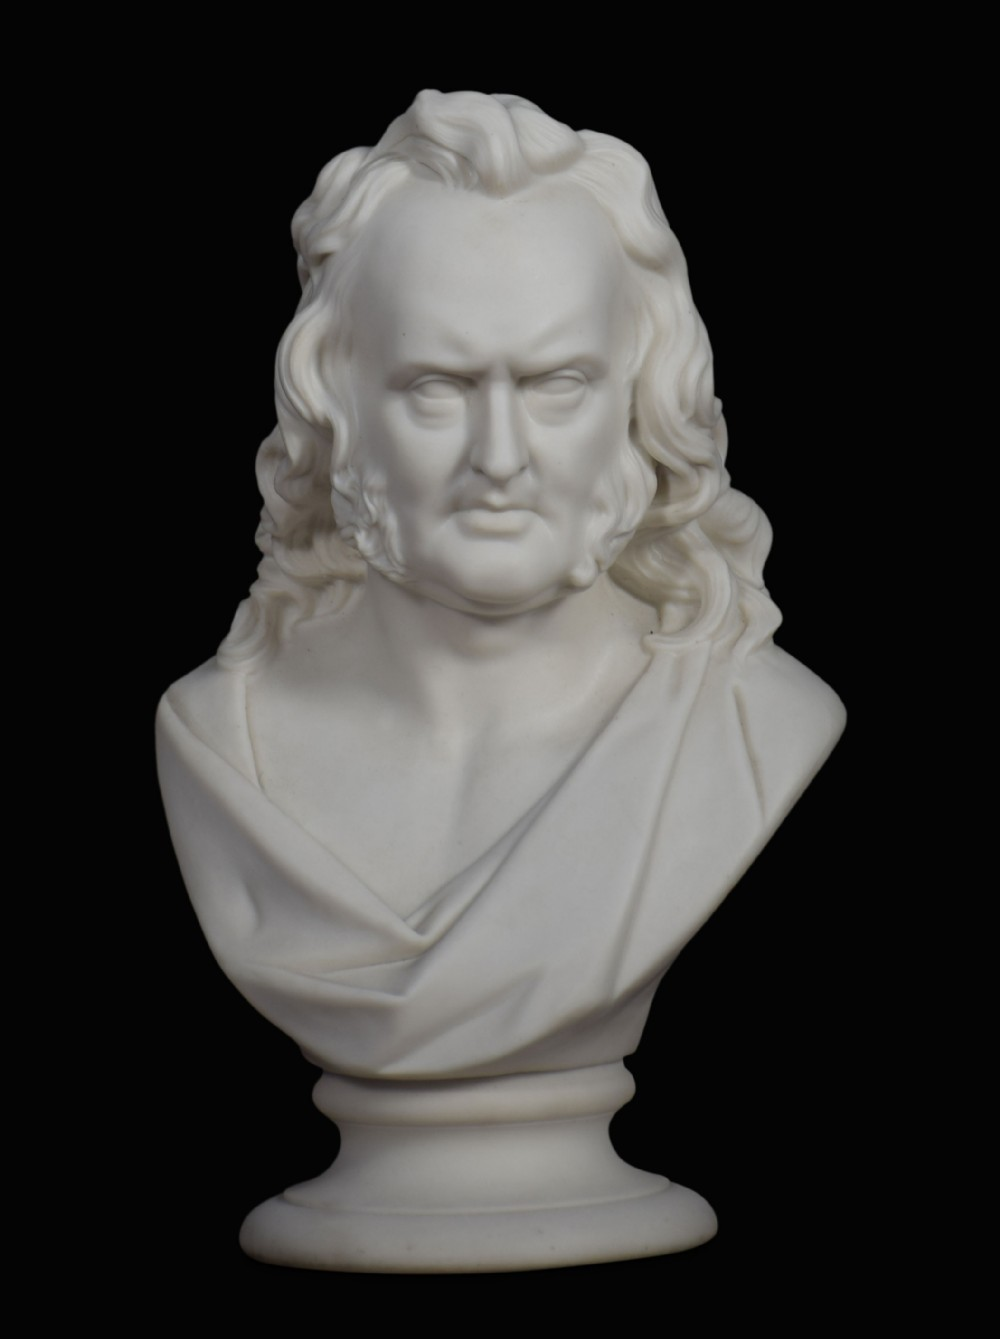 19th bust of professor john wilson